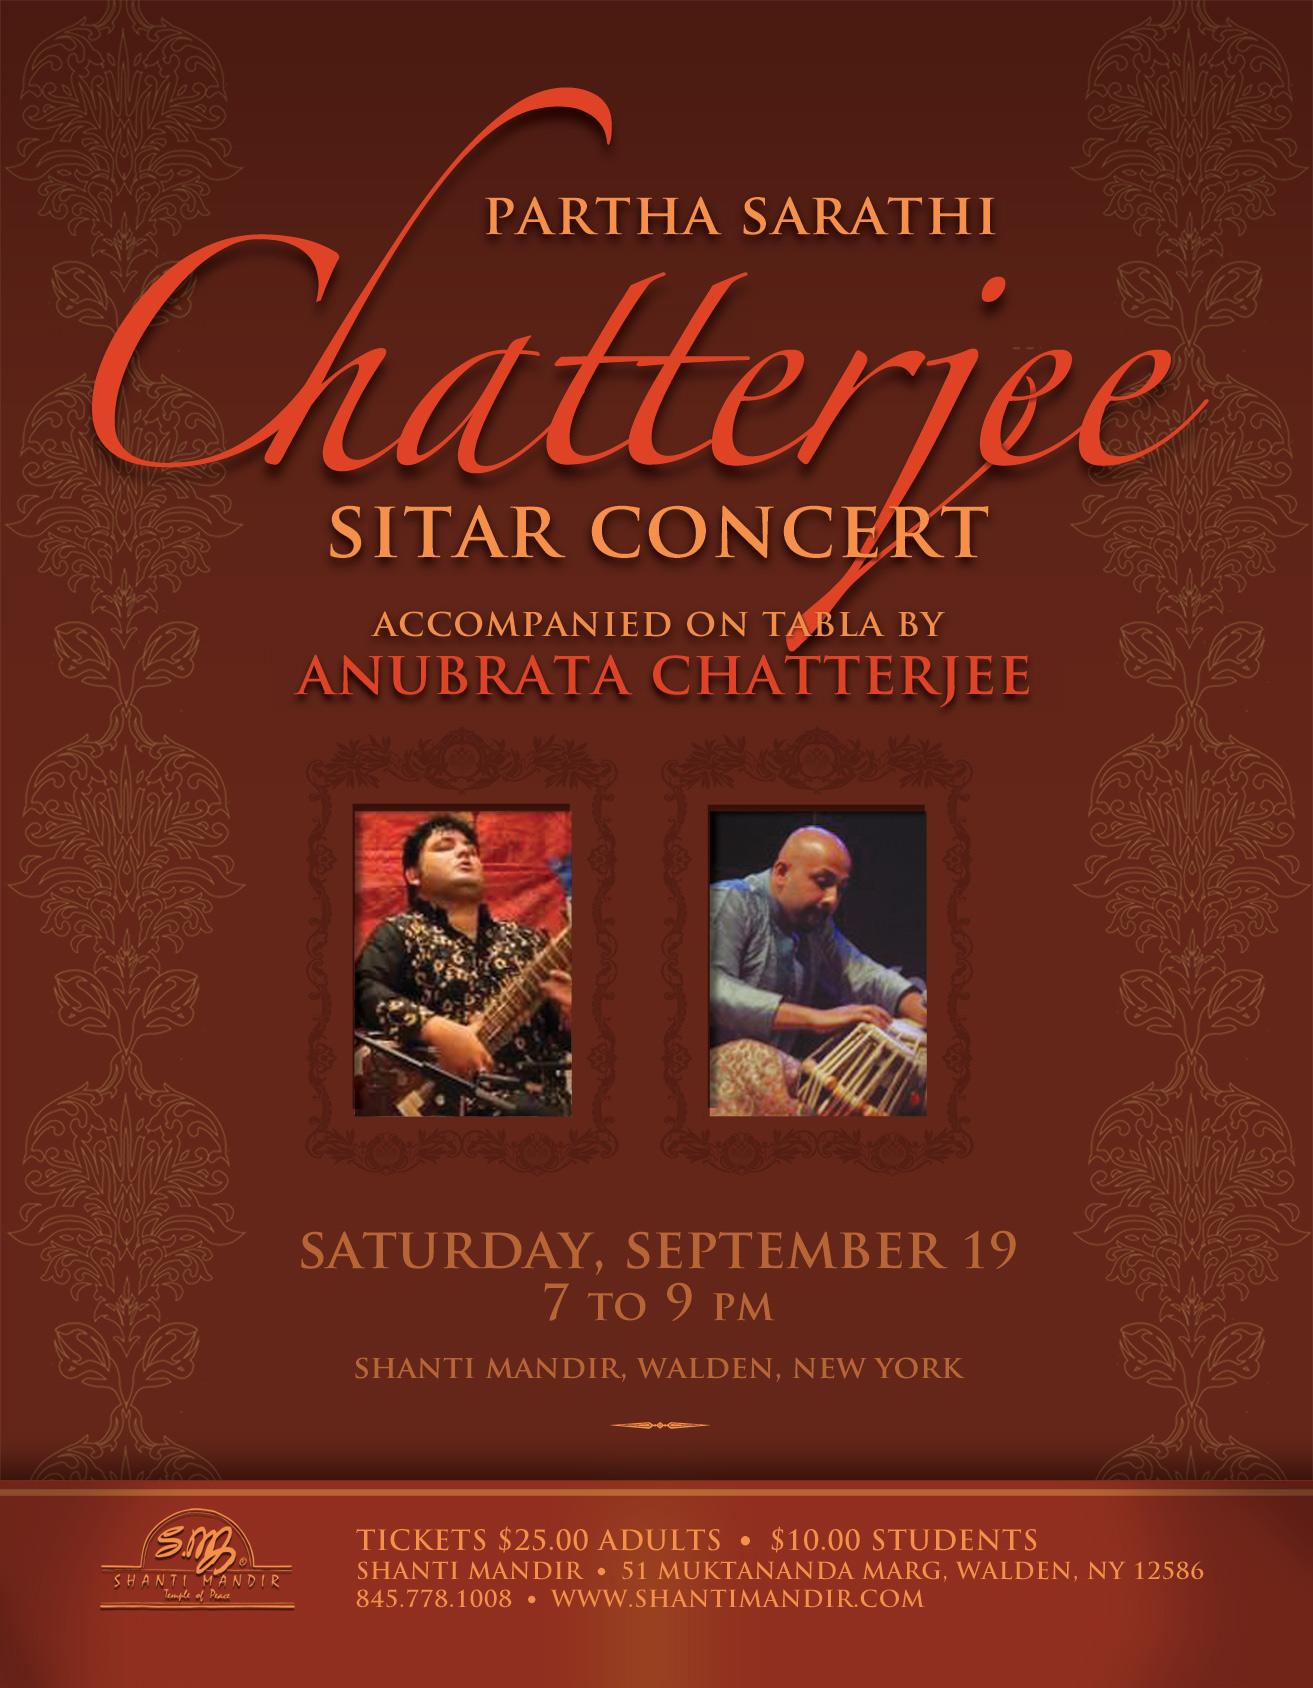 Chatterjee Concert-Flyer-Sept 2015